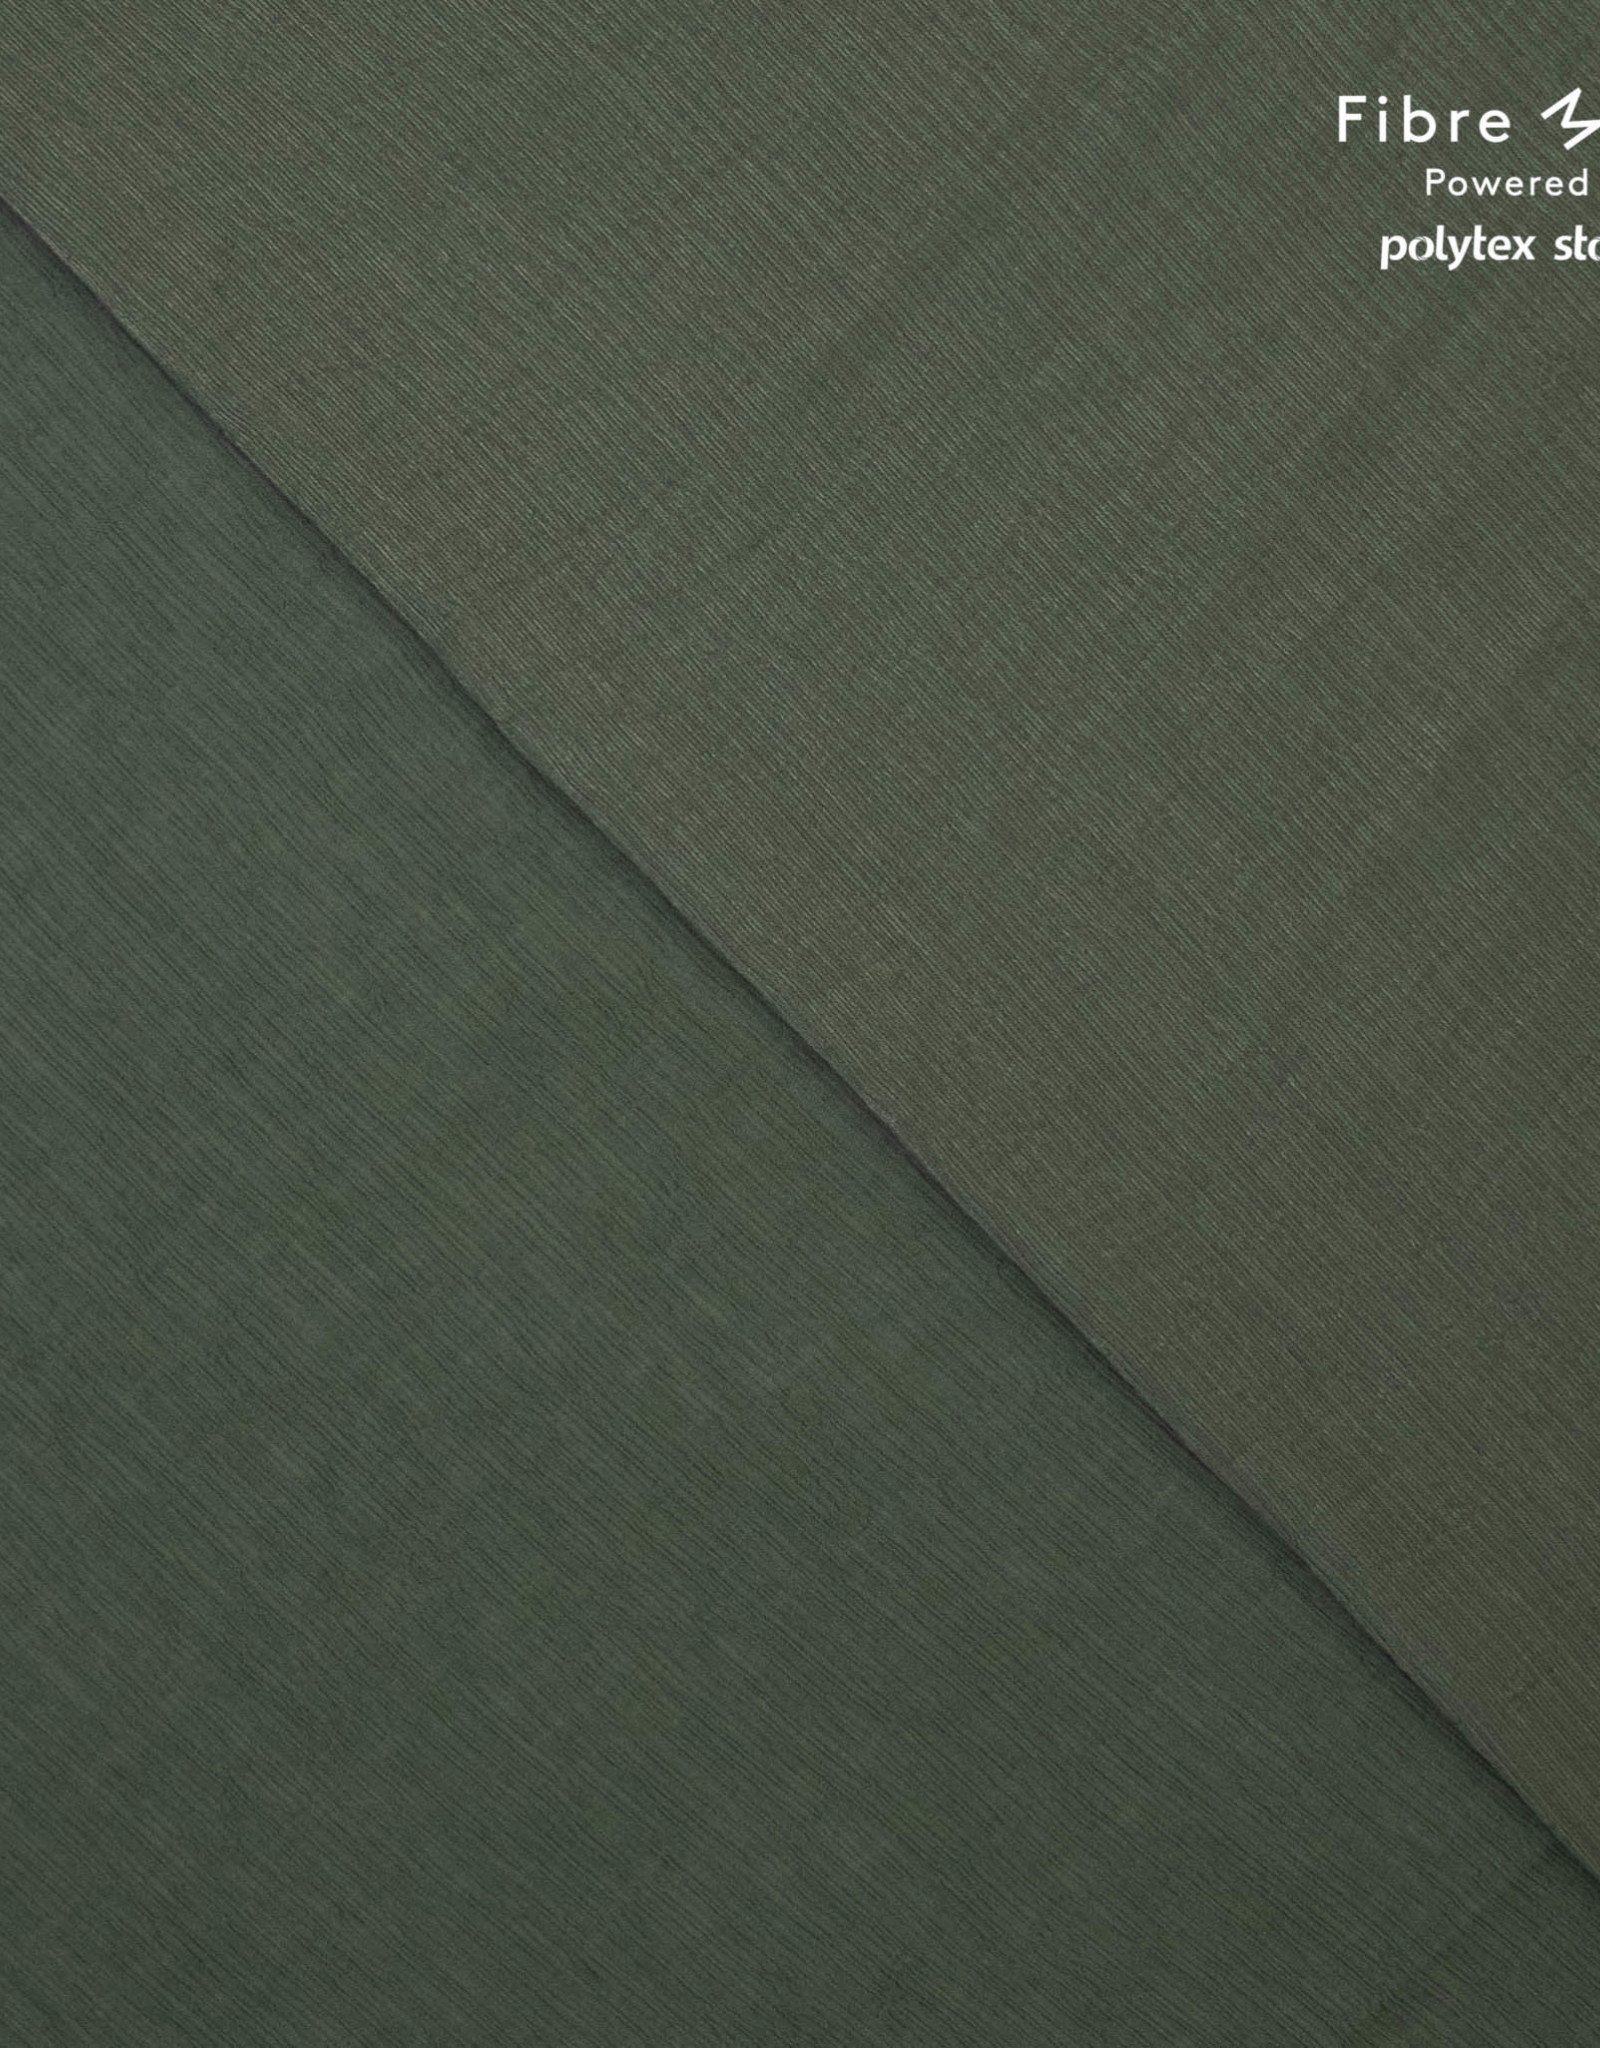 Fibre Mood Fibre Mood editie 14 Woven viscose Pleated groen  Fiona